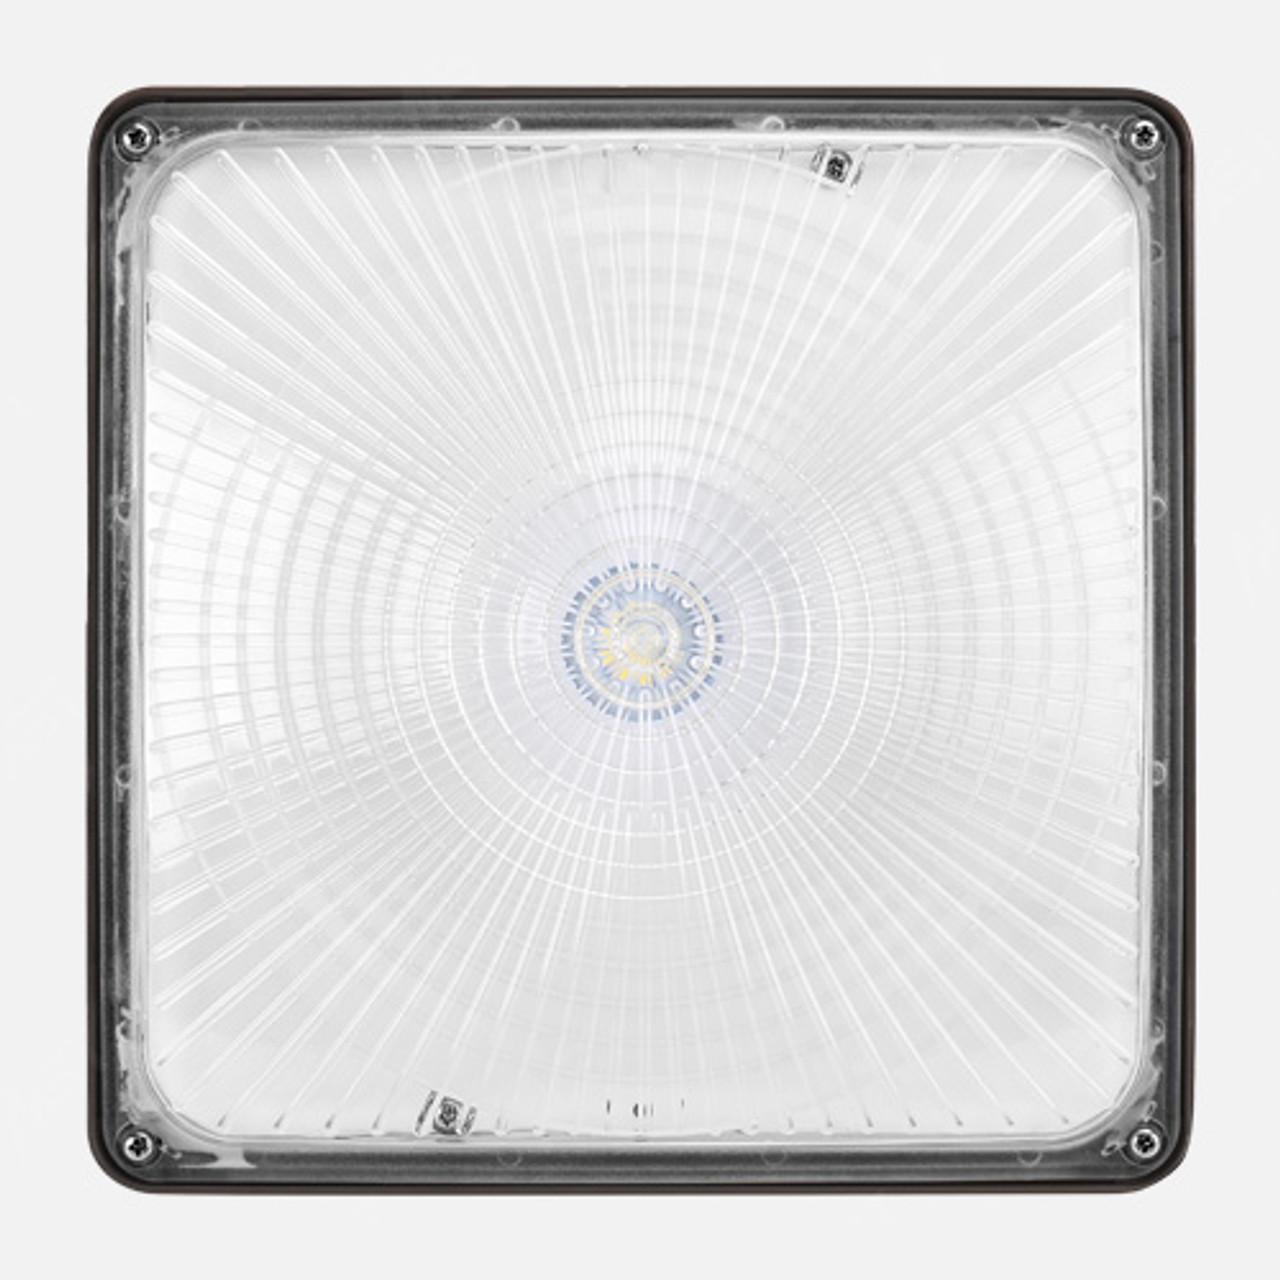 40 Watt LED Canopy Light Front